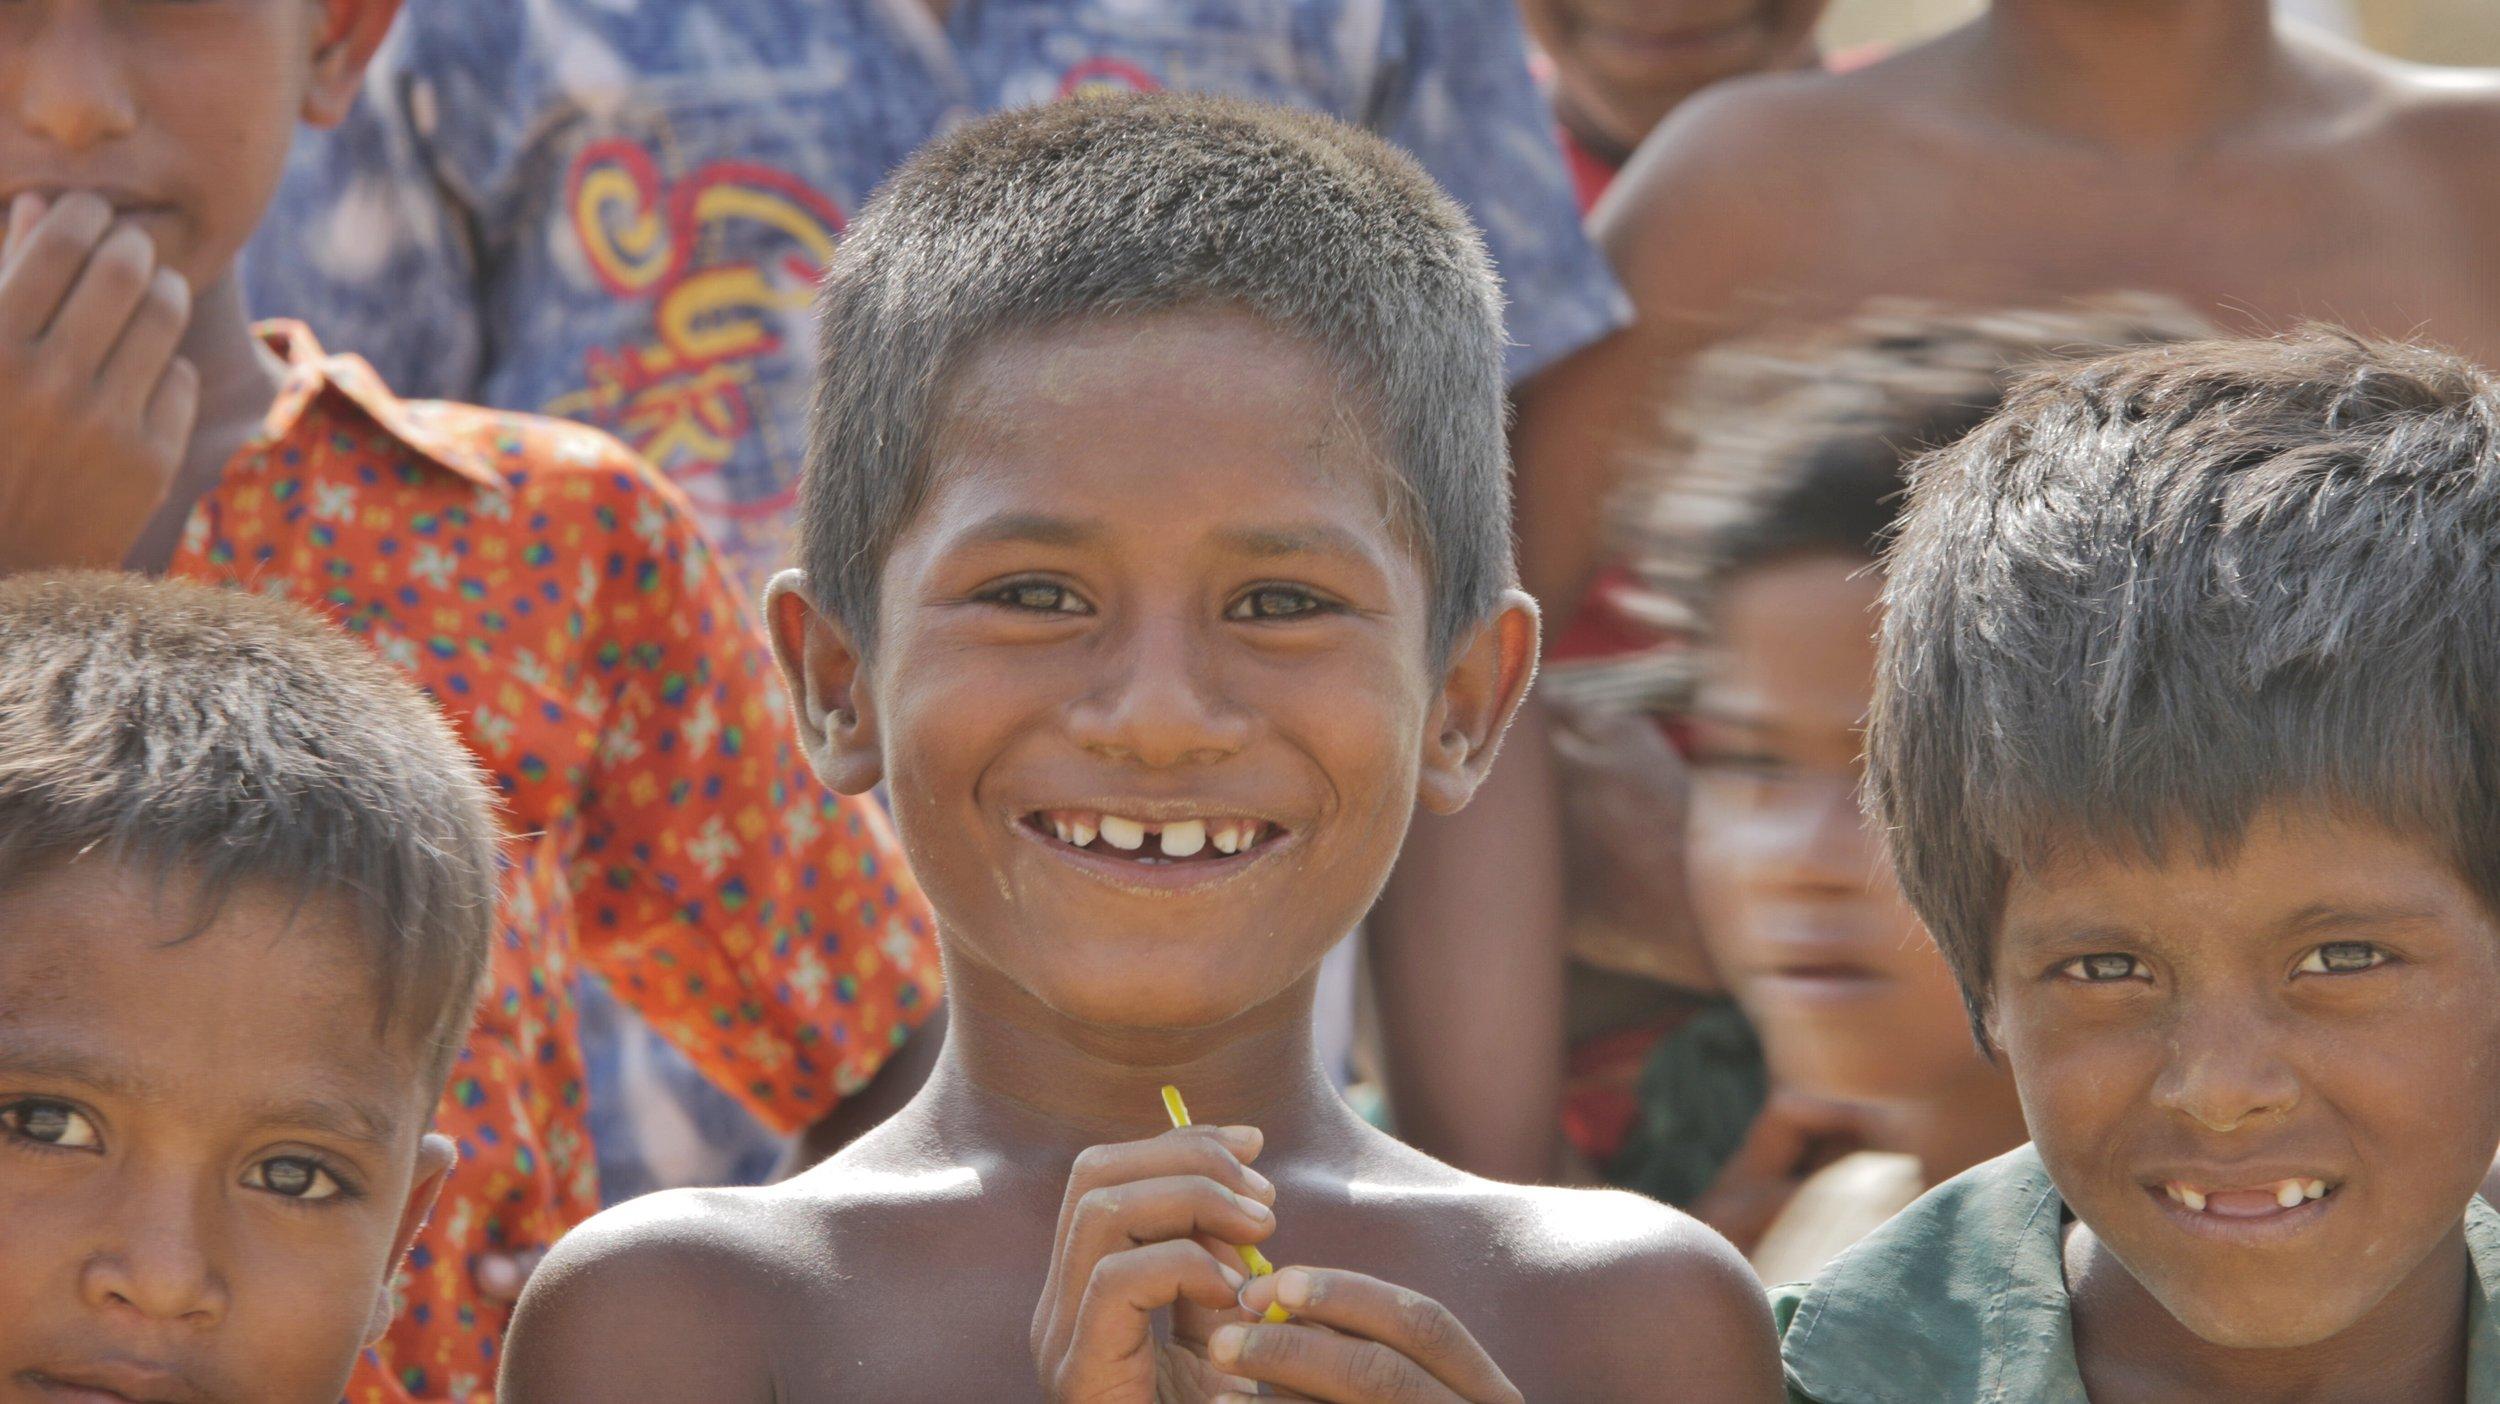 Rohingya Smiling Boy.JPG